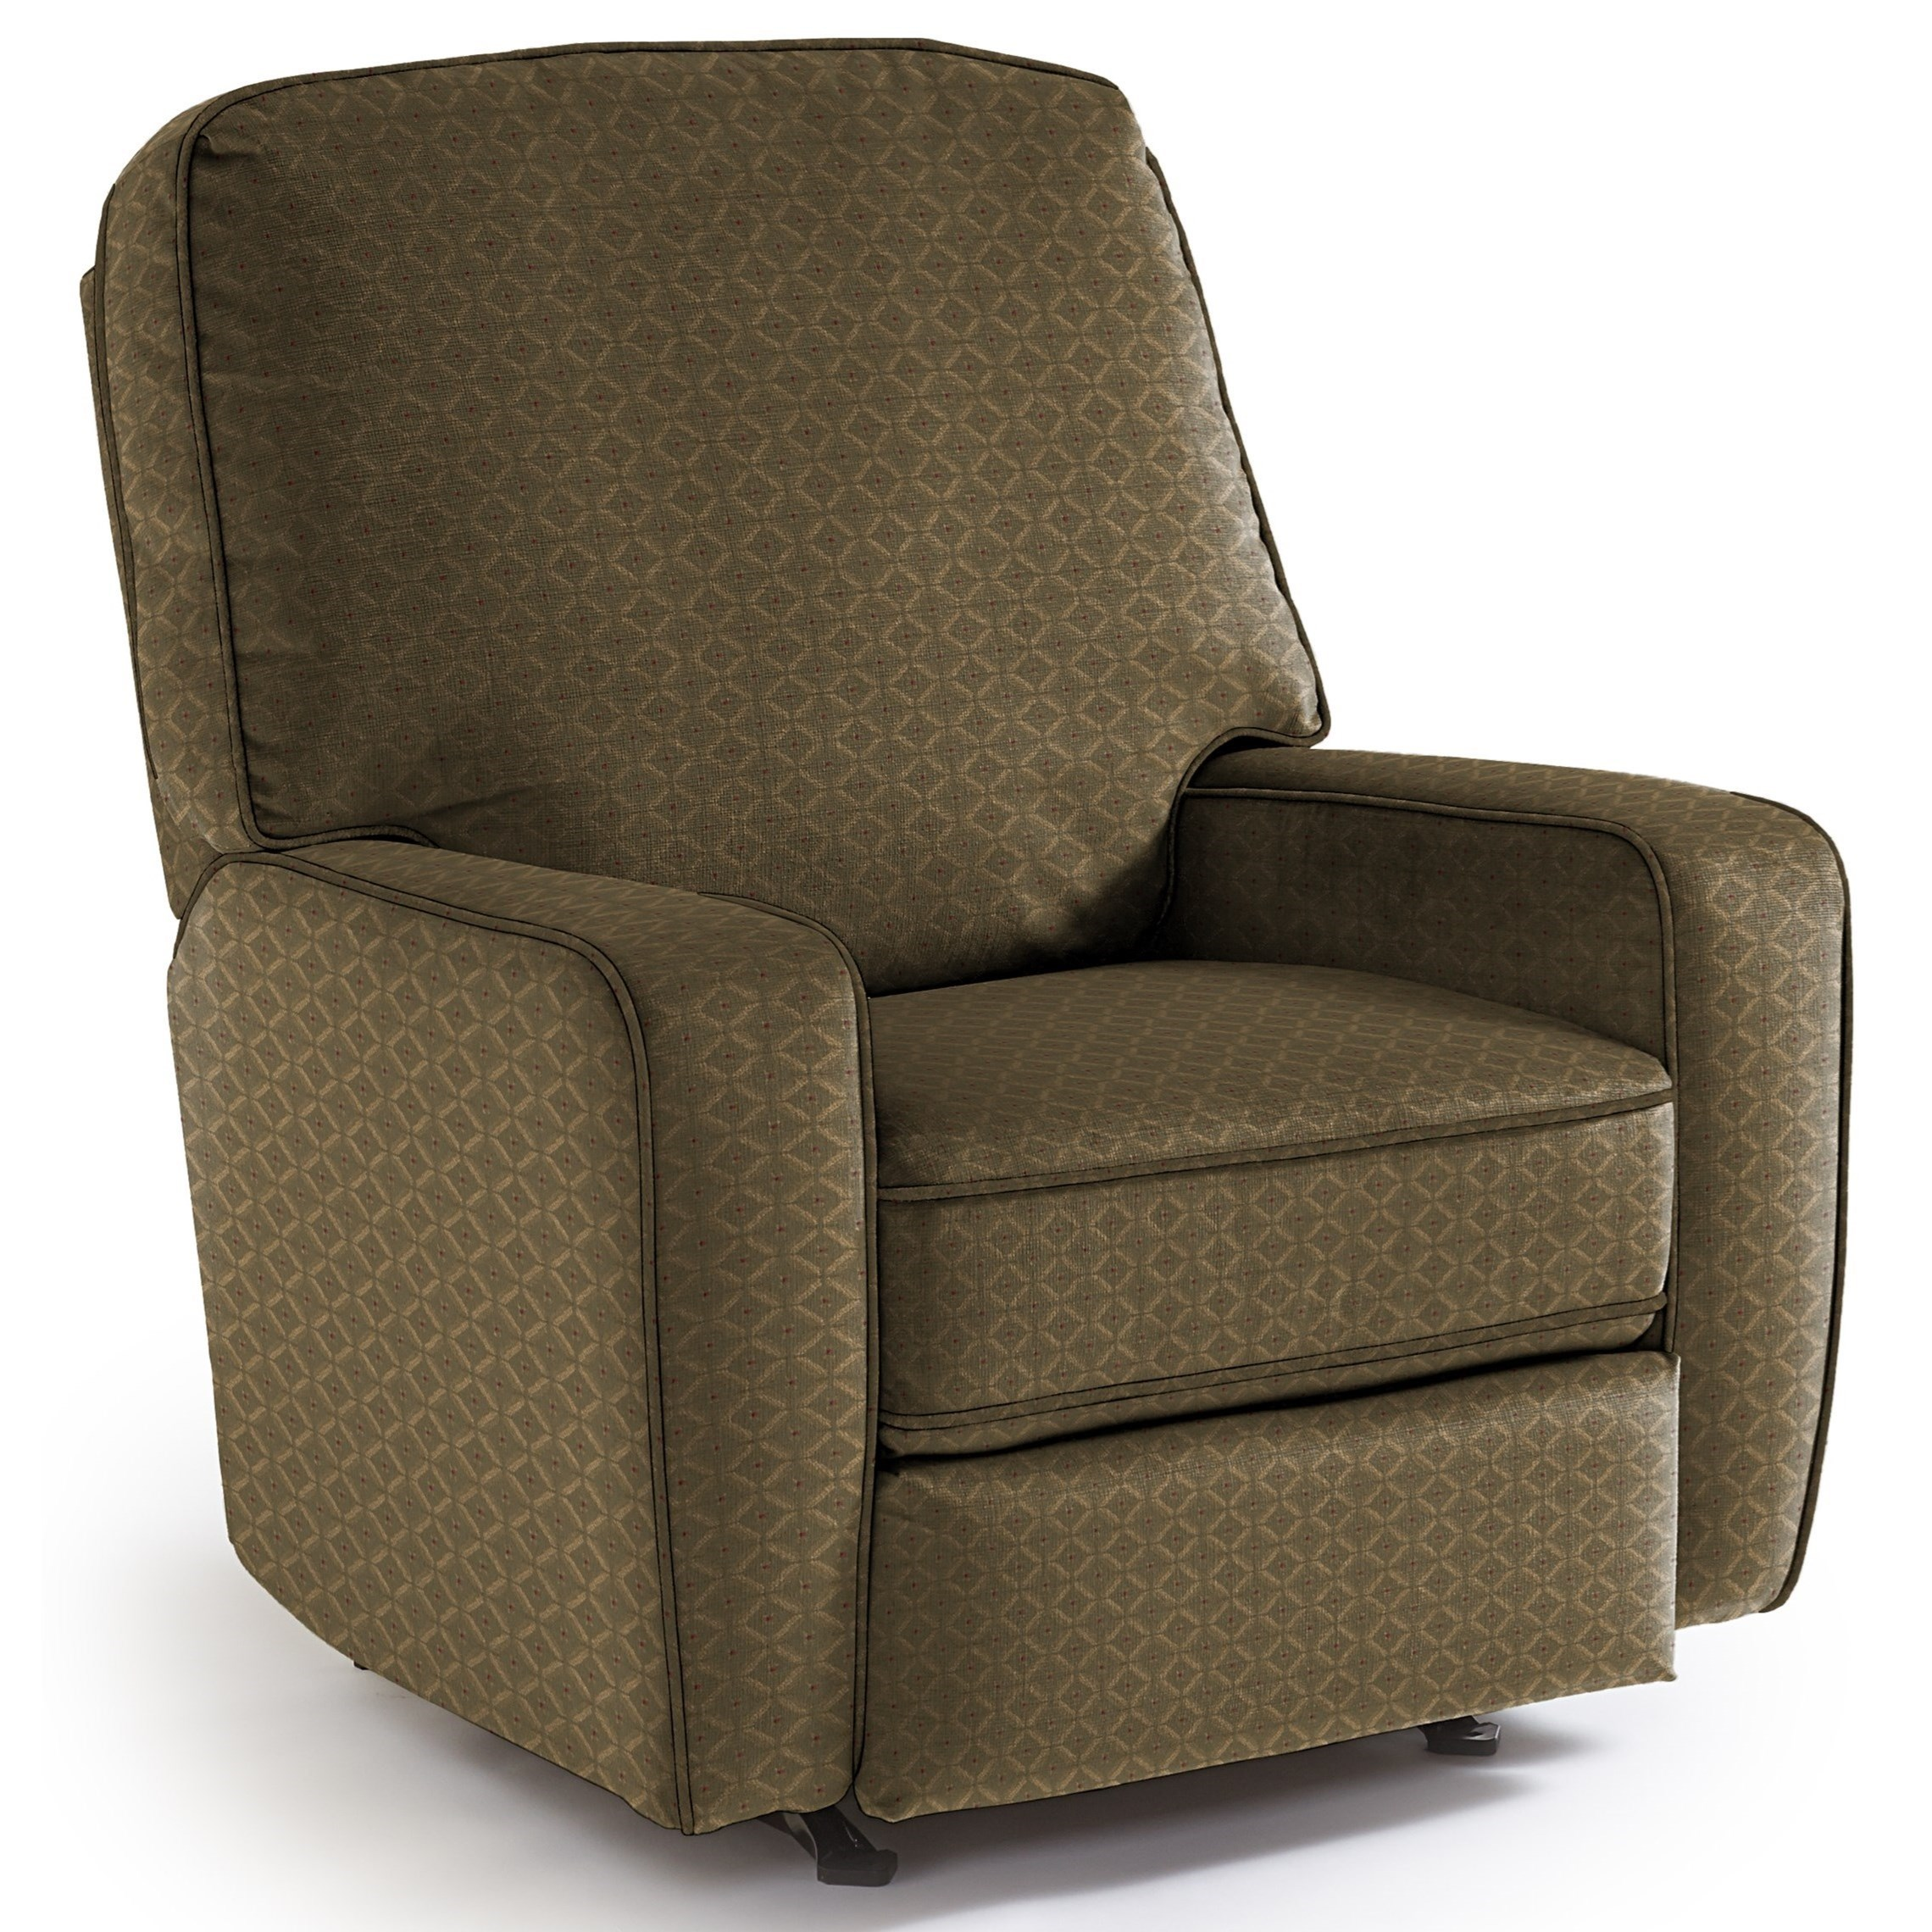 Best Home Furnishings Medium Recliners Bilana Rocking Reclining Chair